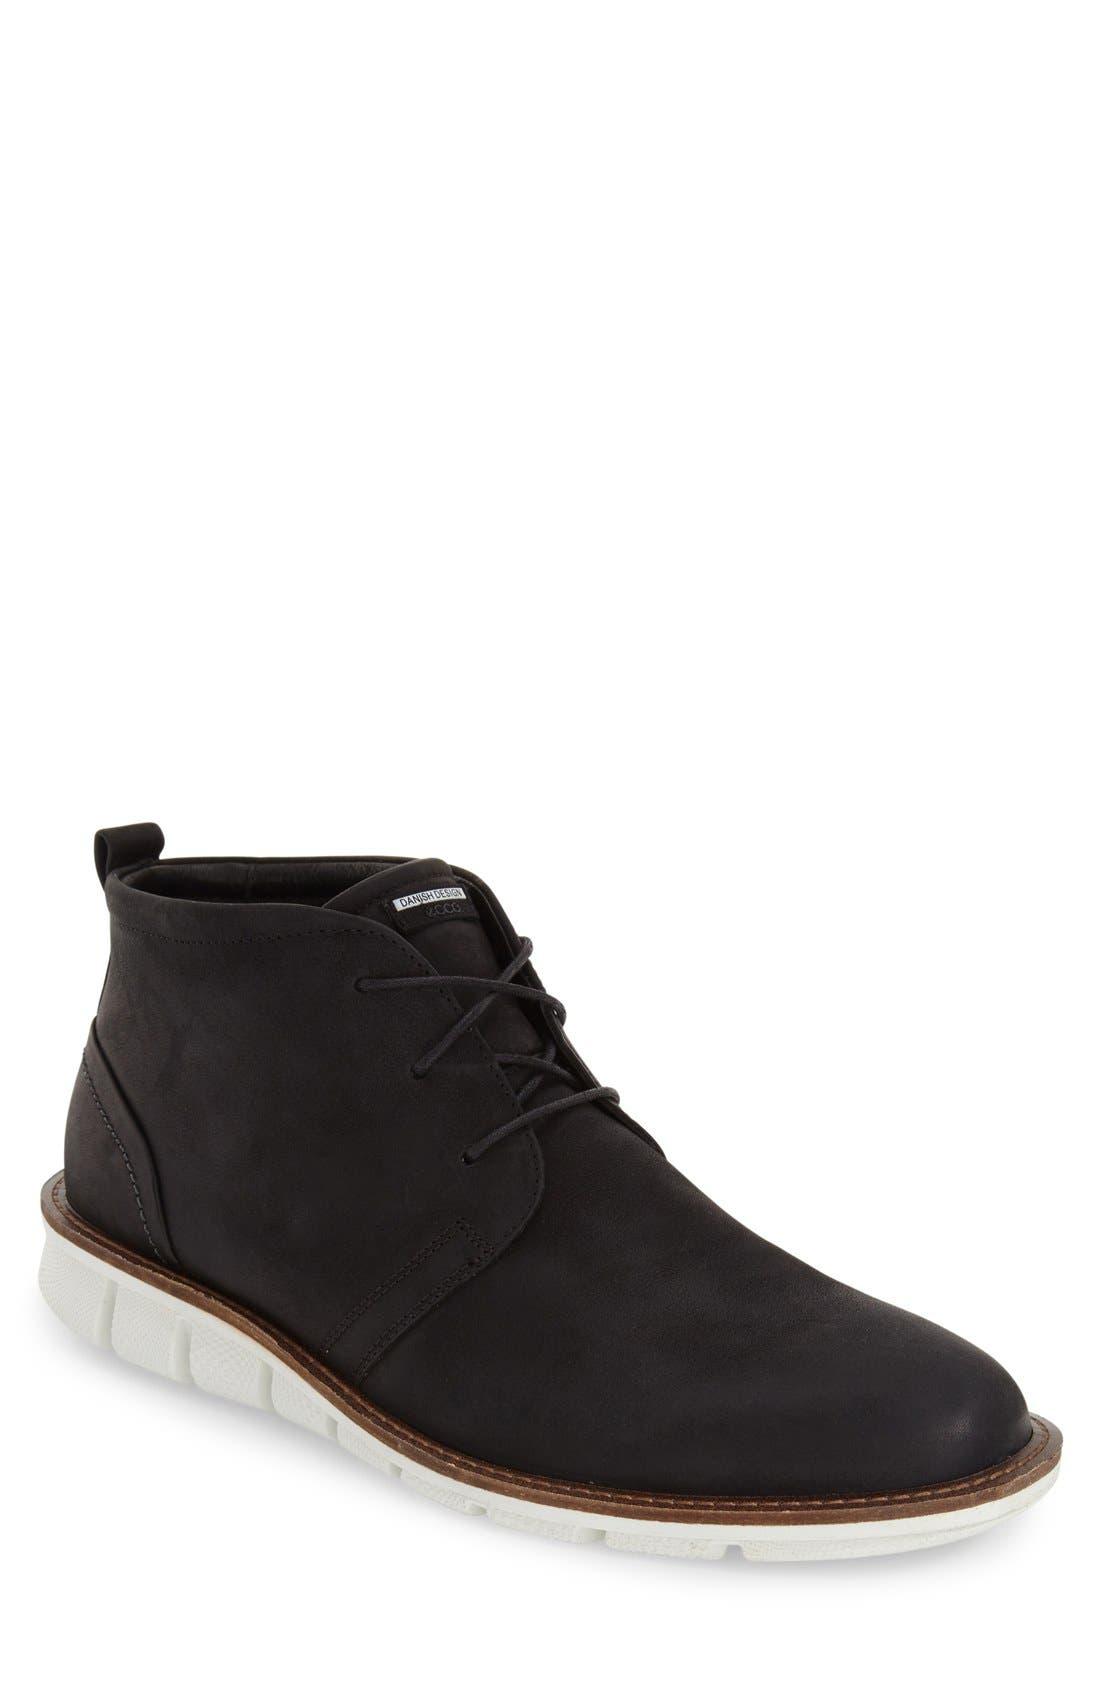 'Jeremy Hybrid' Plain Toe Boot,                         Main,                         color,